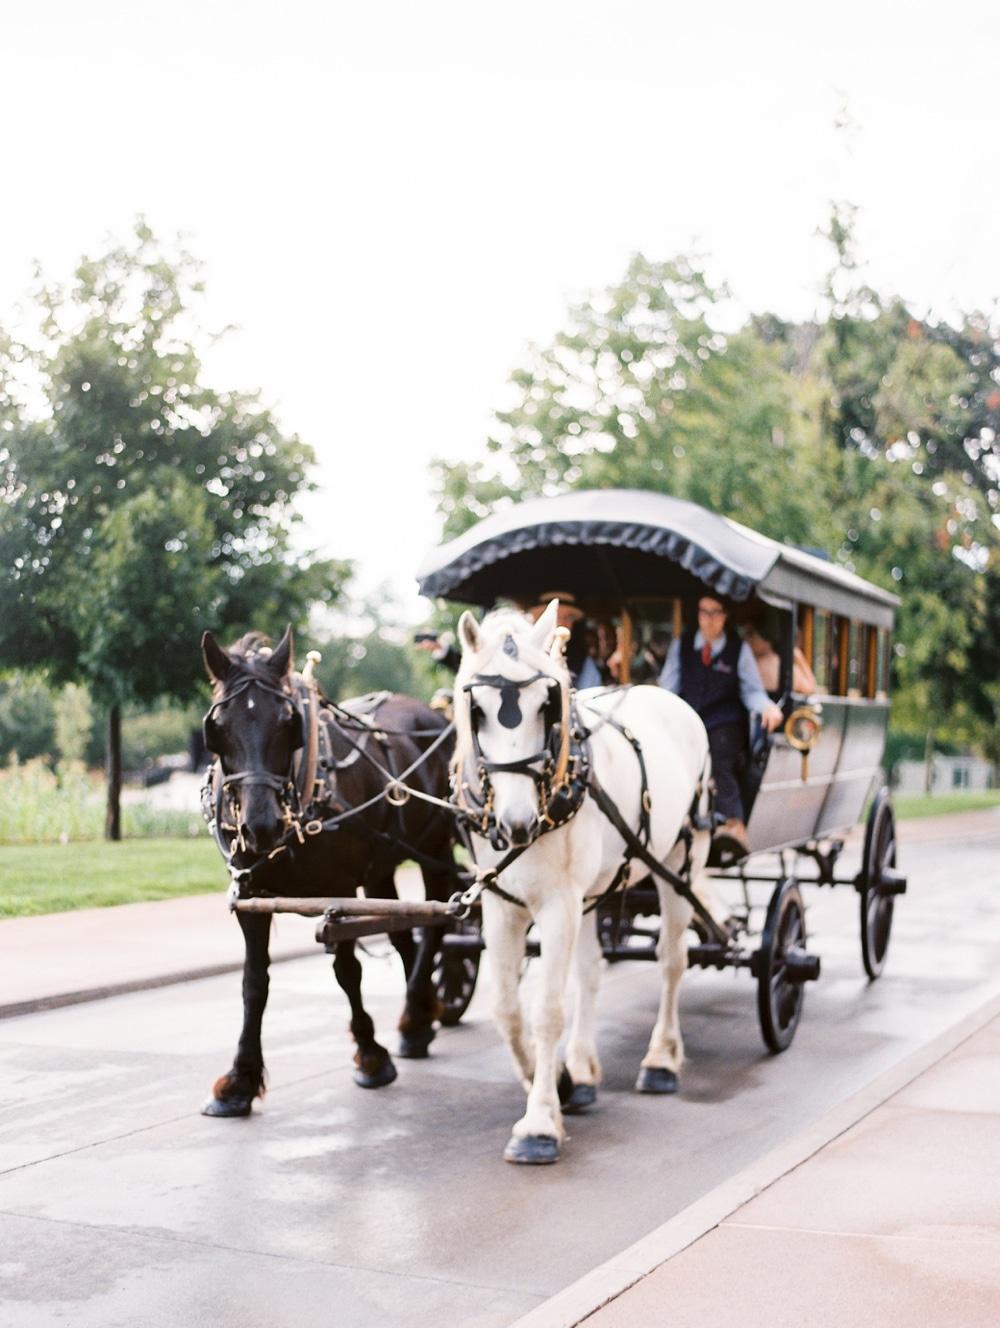 kristin-la-voie-photography-henry-ford-museum-detroit-wedding-photographer-138